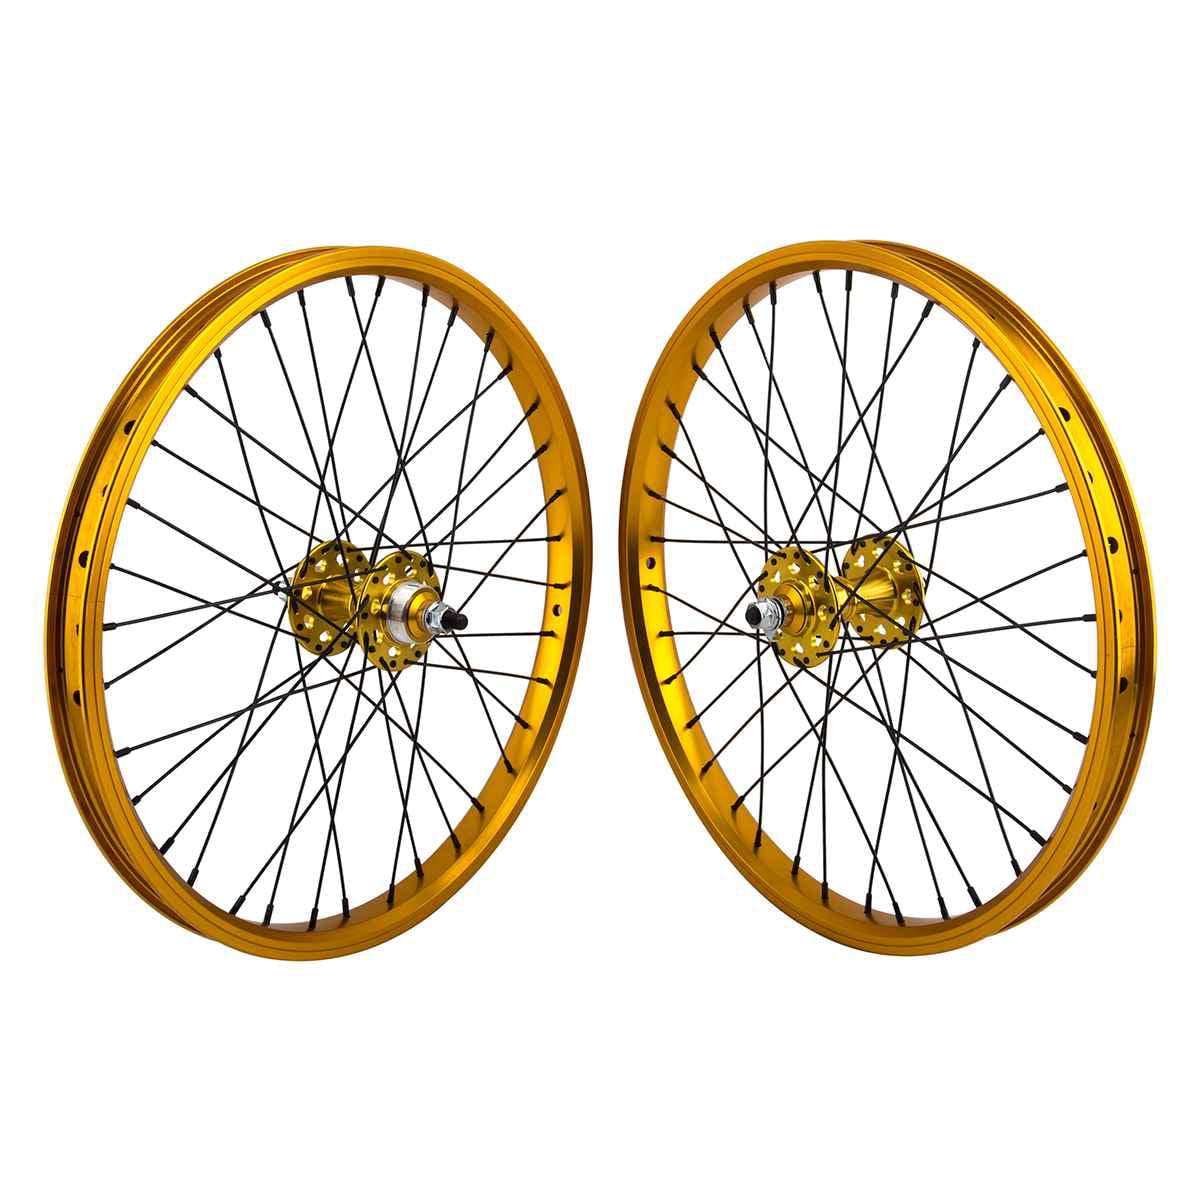 SE Bikes Whl Pr 20X1.75 406X24 Se Racing Gd 36 Se Racing ...